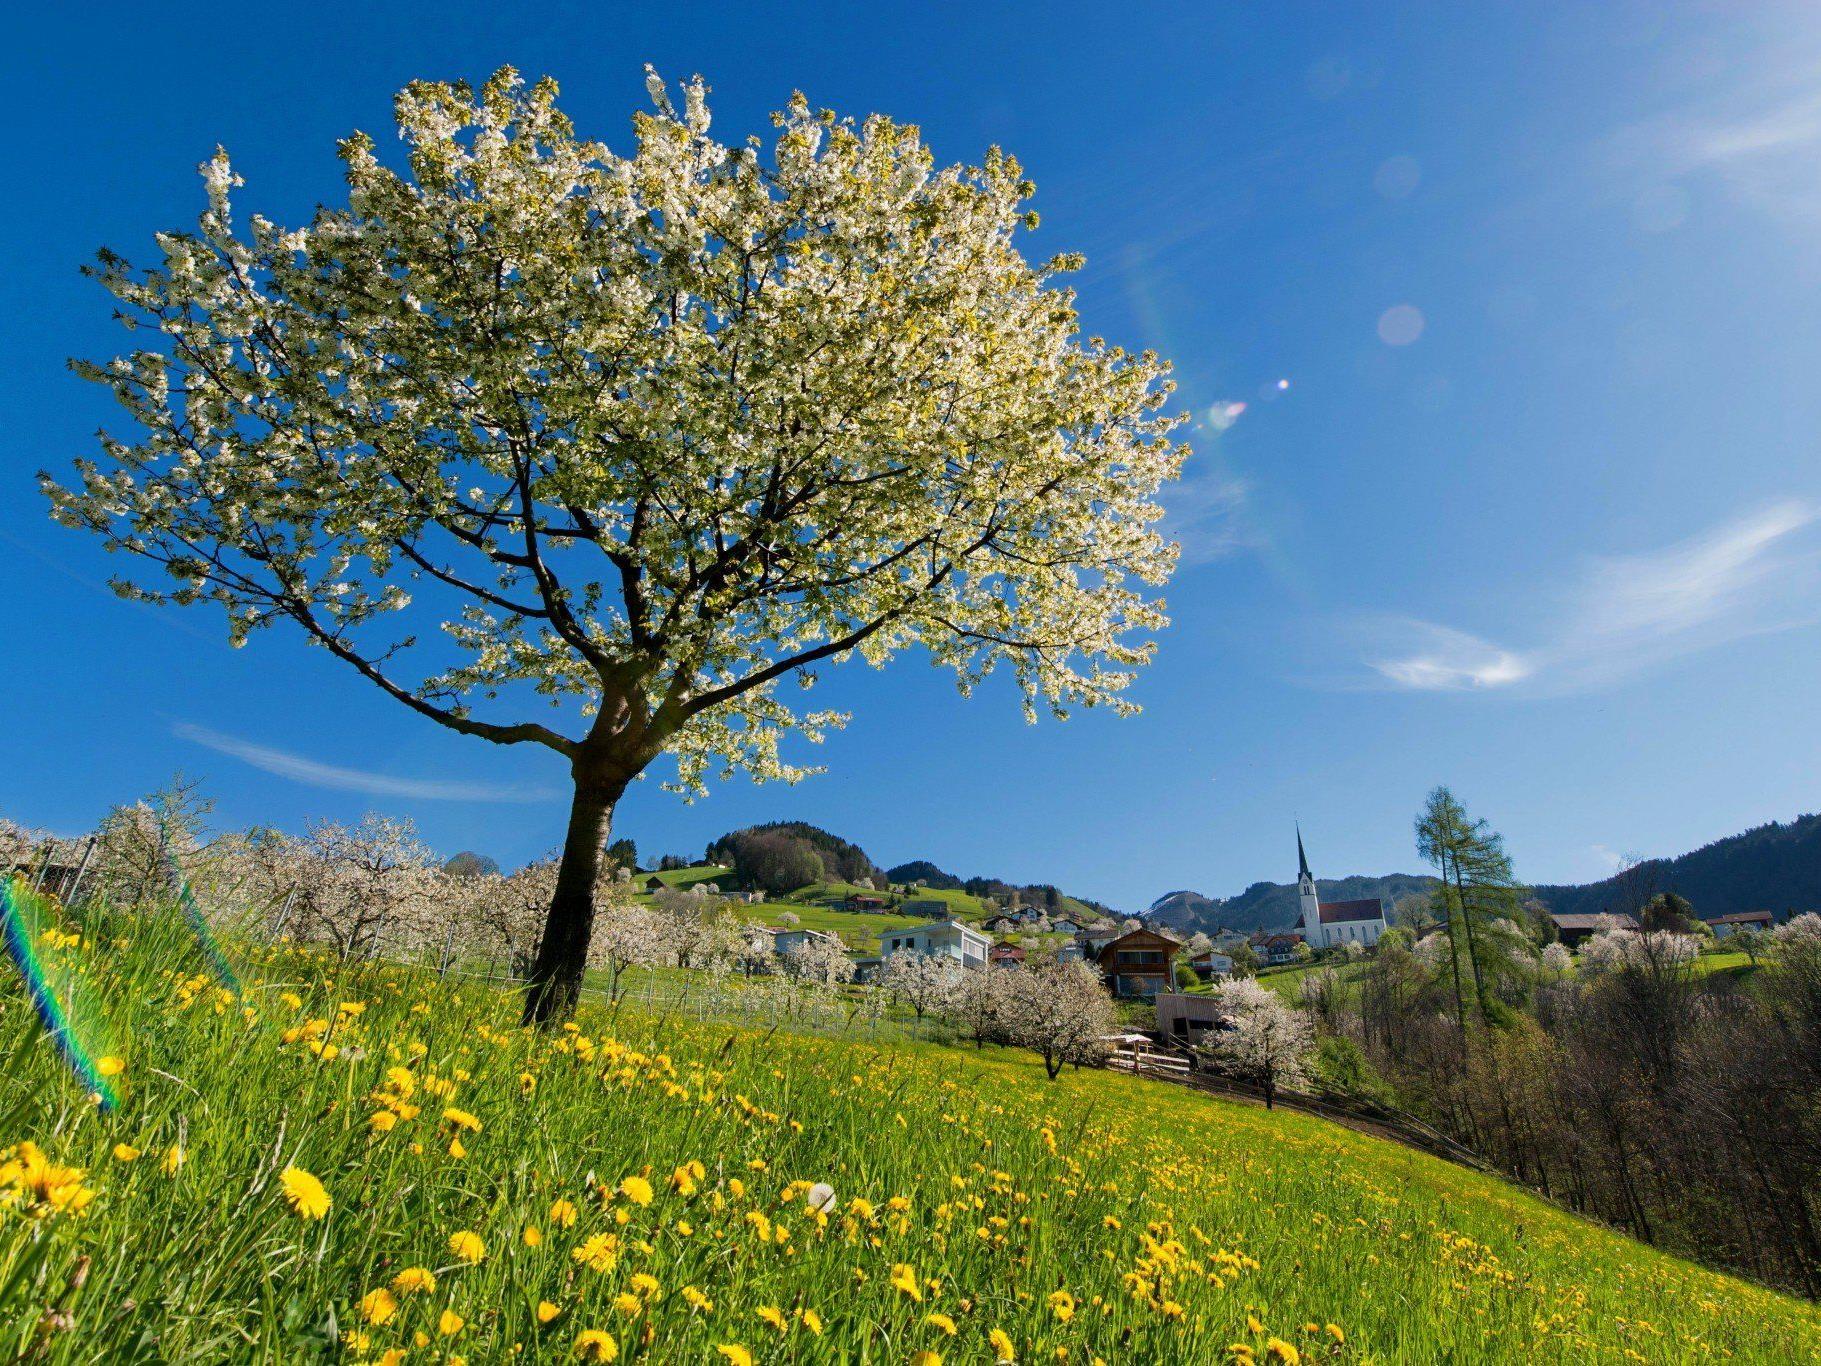 Zumindest an den Vormittagen kann man den Anblick der Kirschbäume in Fraxern ohne Regenschirm genießen.